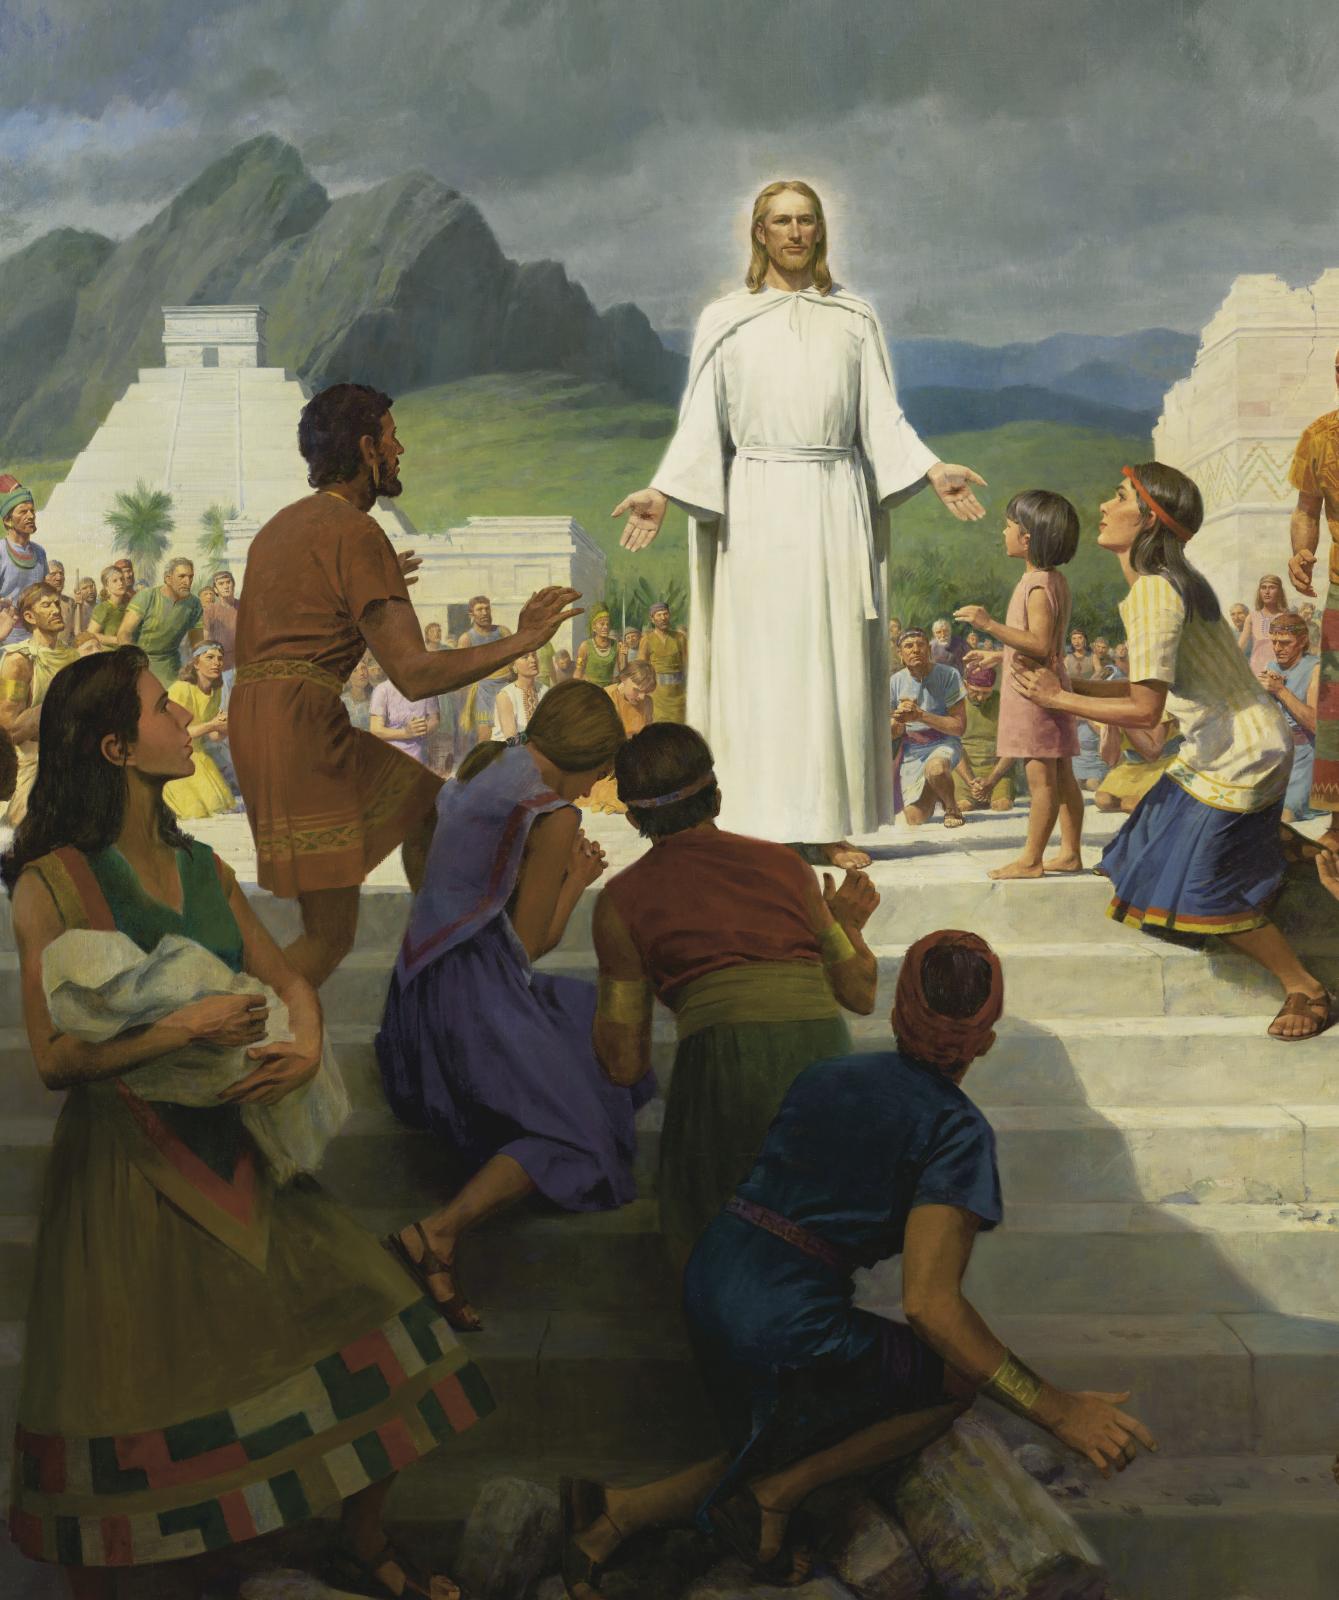 Detail Jezus Christus Verschijnt In Amerika